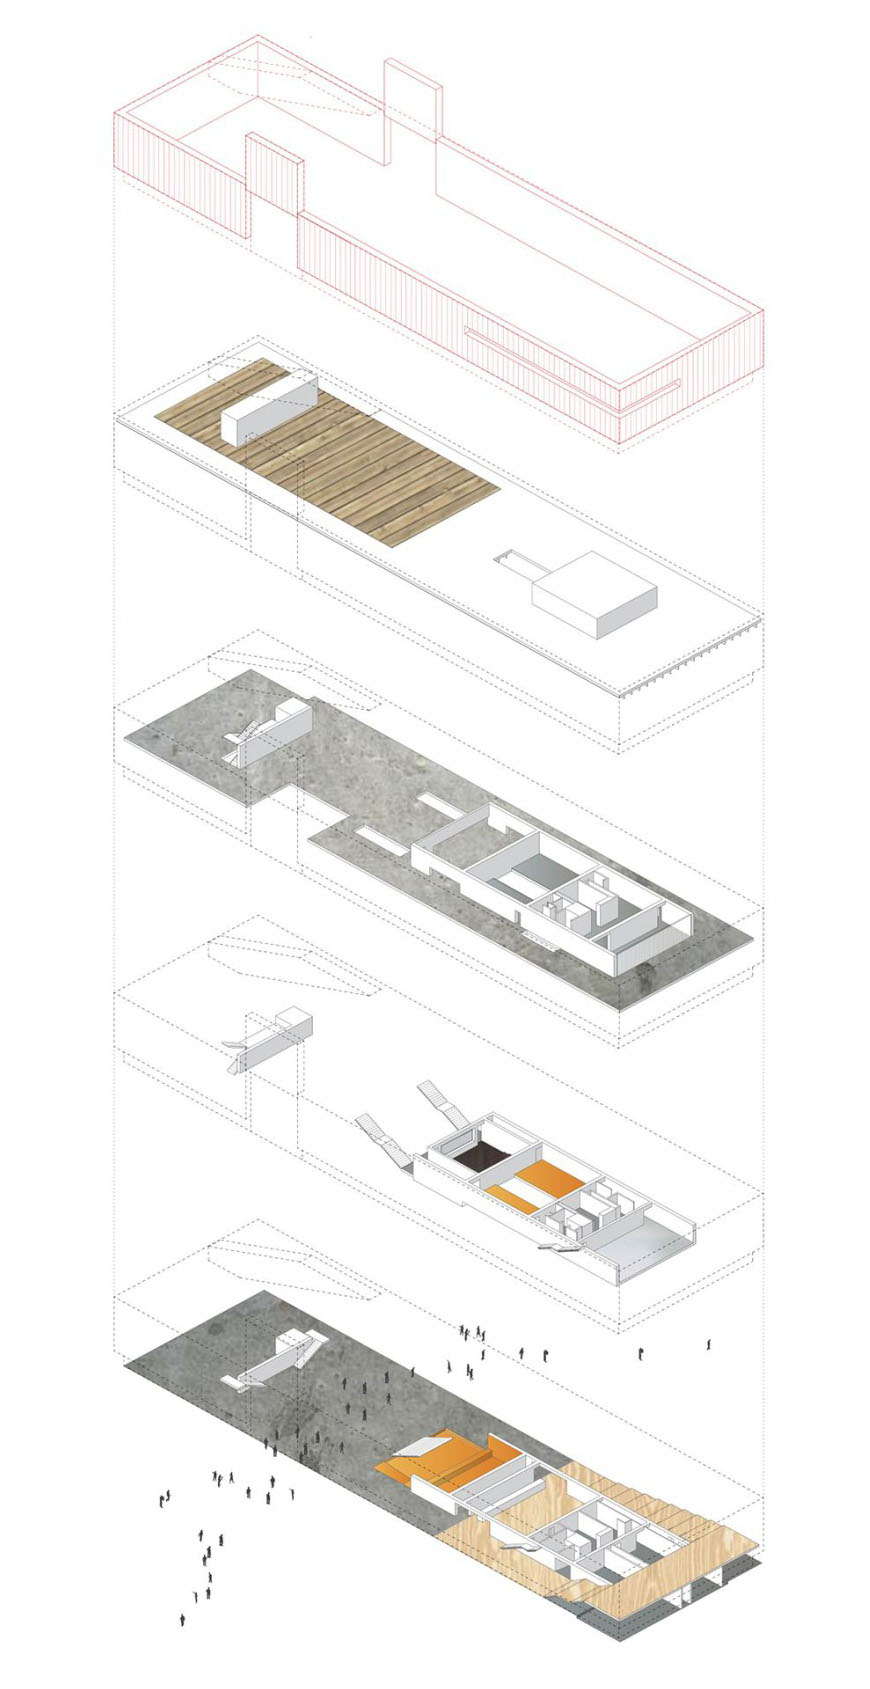 garage-contemporary-art-museum-moscow-axonometric-cutout